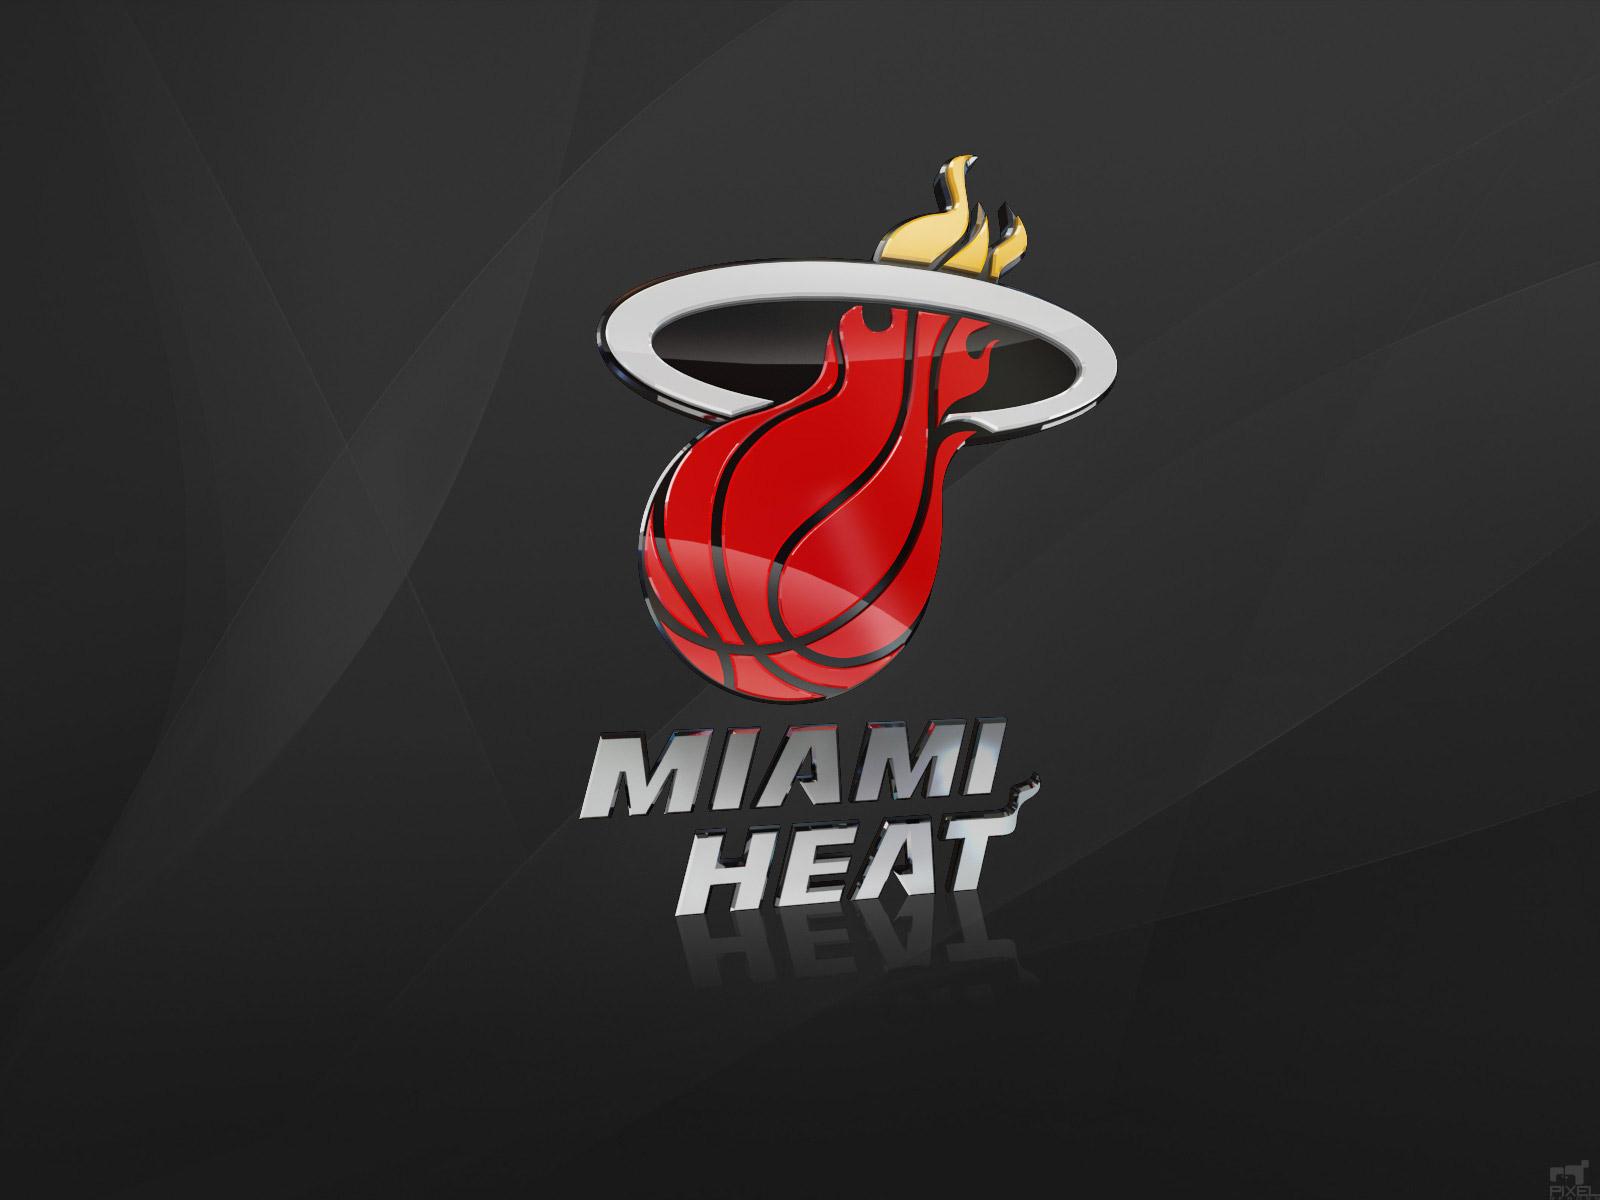 Nba Miami Heat Logo - HD Wallpaper